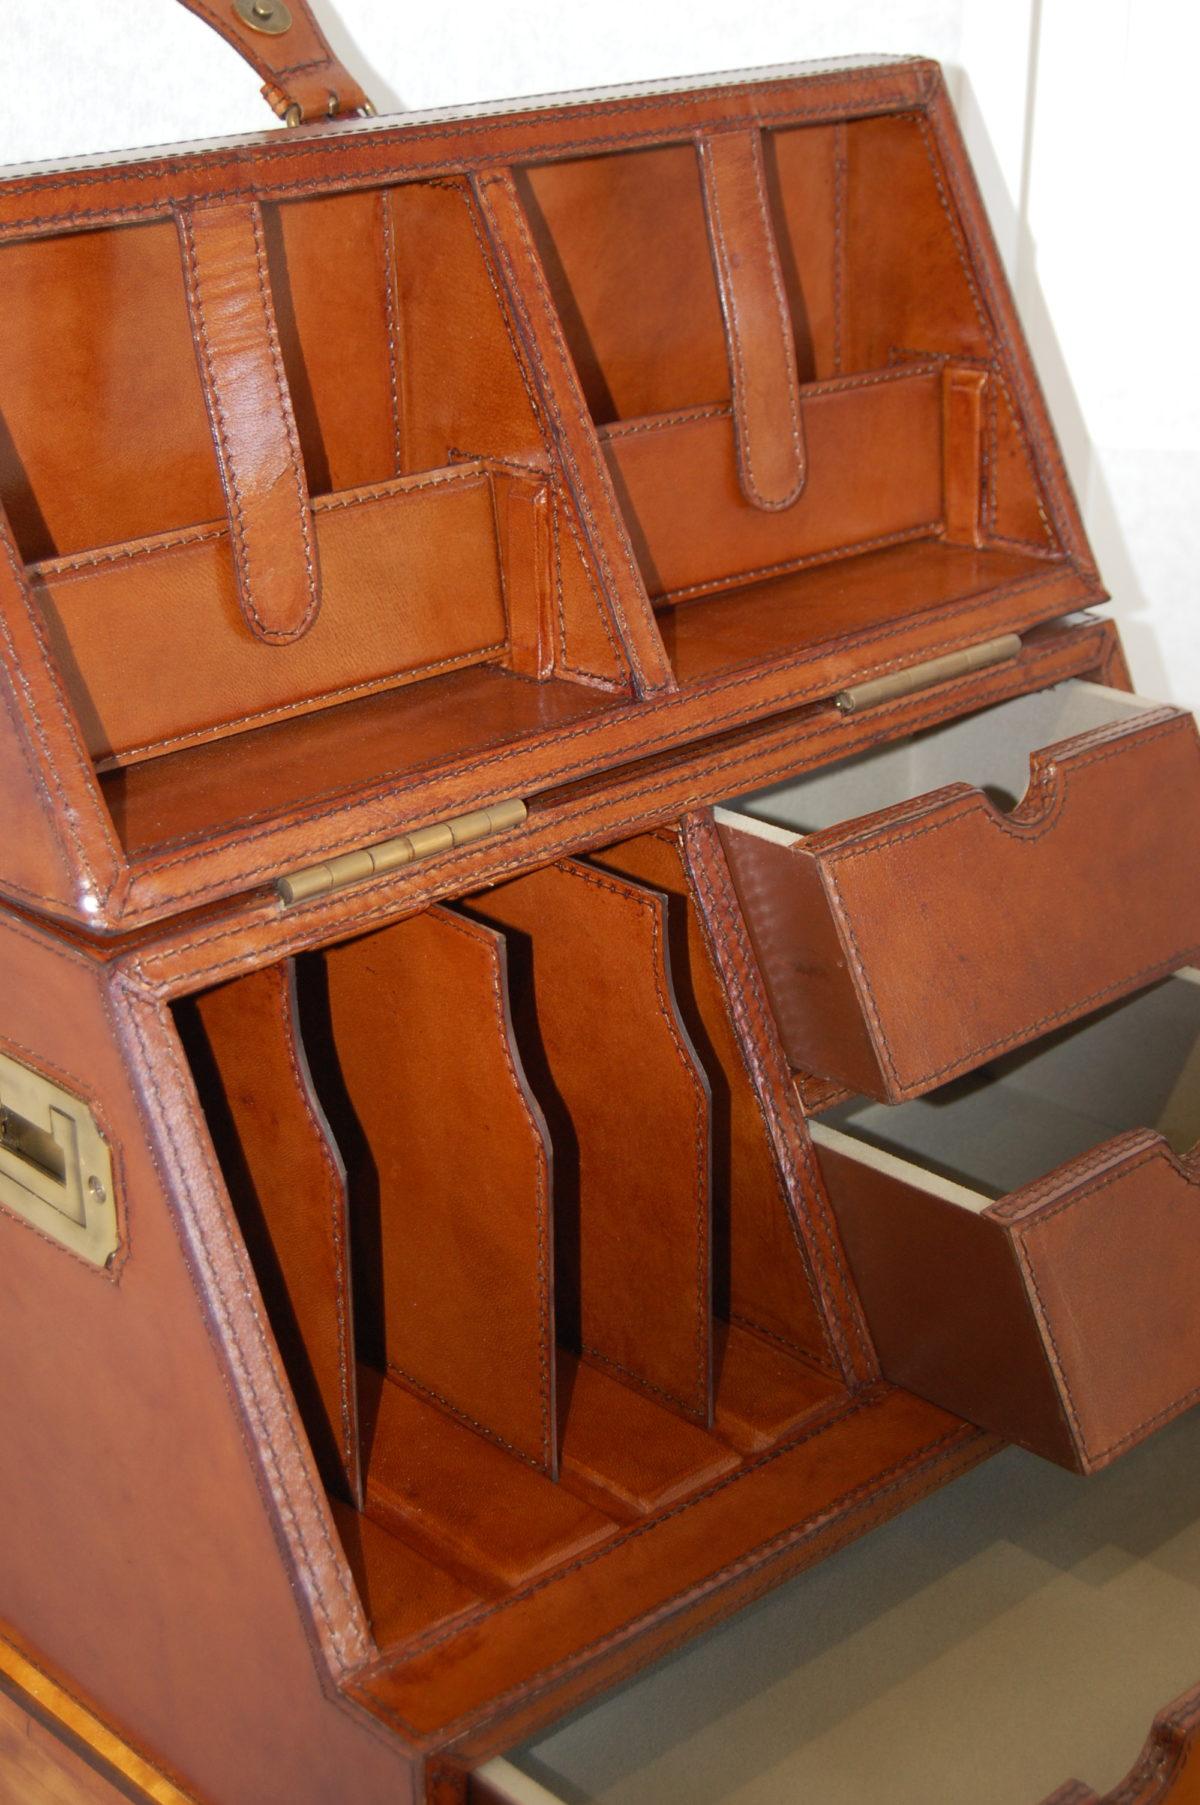 Portable Stationay box